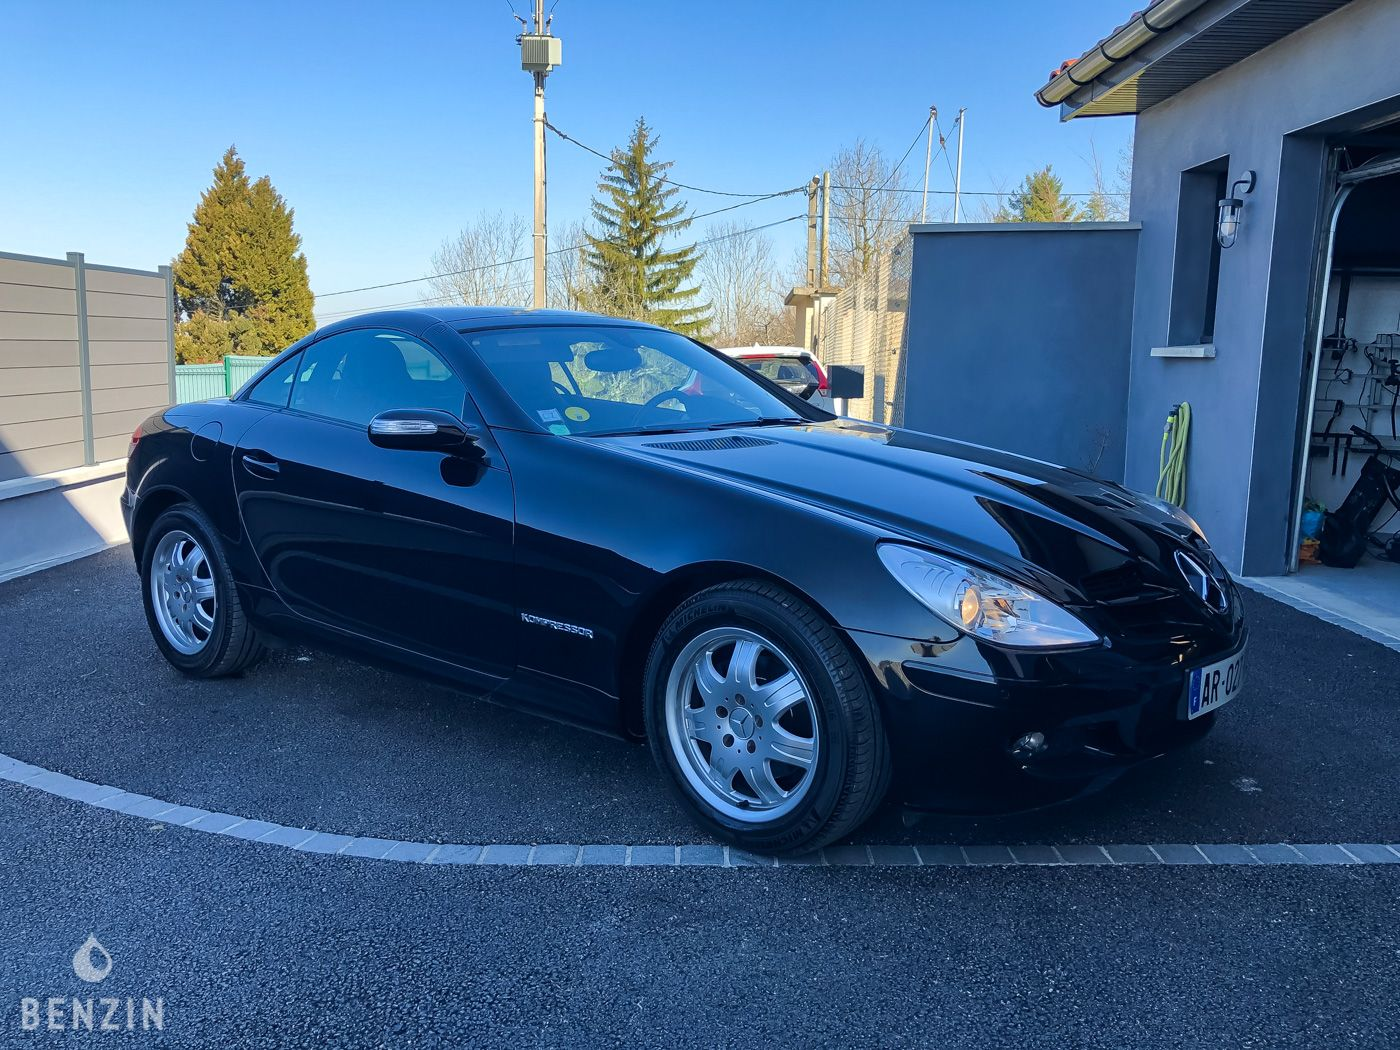 Mercedes SLK 200k occasion à vendre se vende for sale te koop zu verkaufen